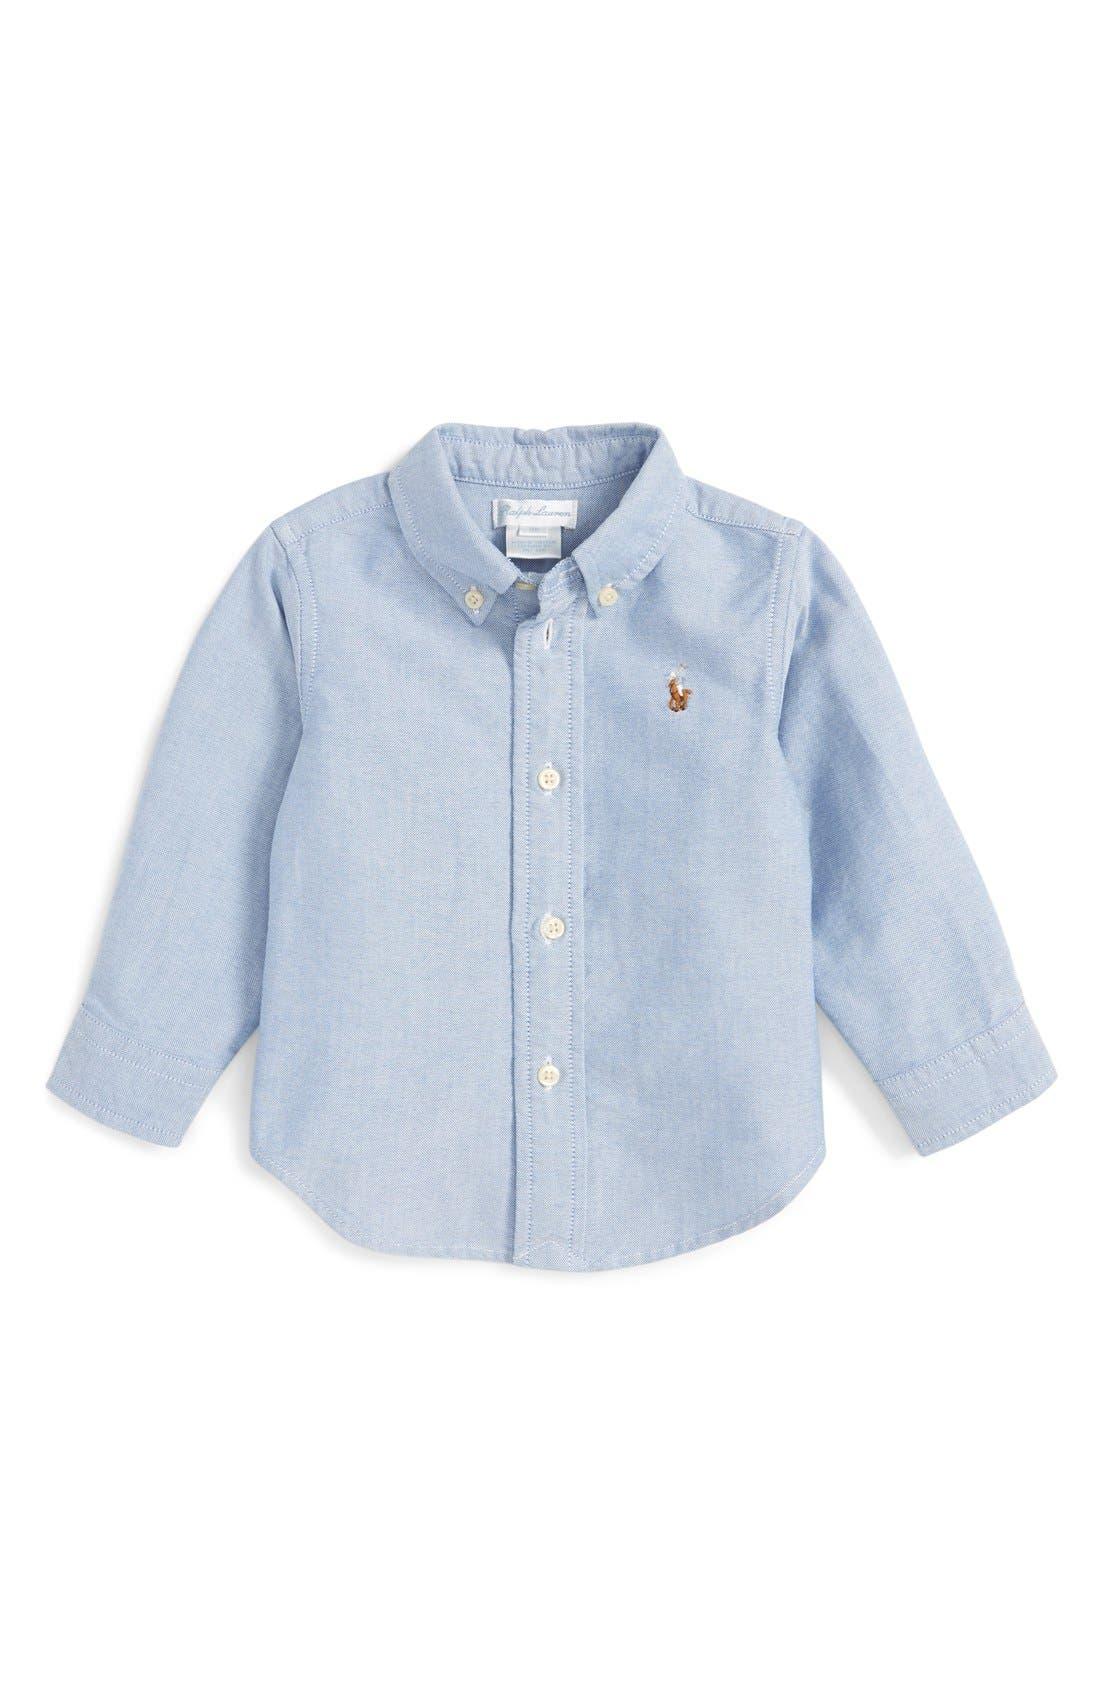 Oxford Shirt,                             Main thumbnail 1, color,                             Oxford Blue